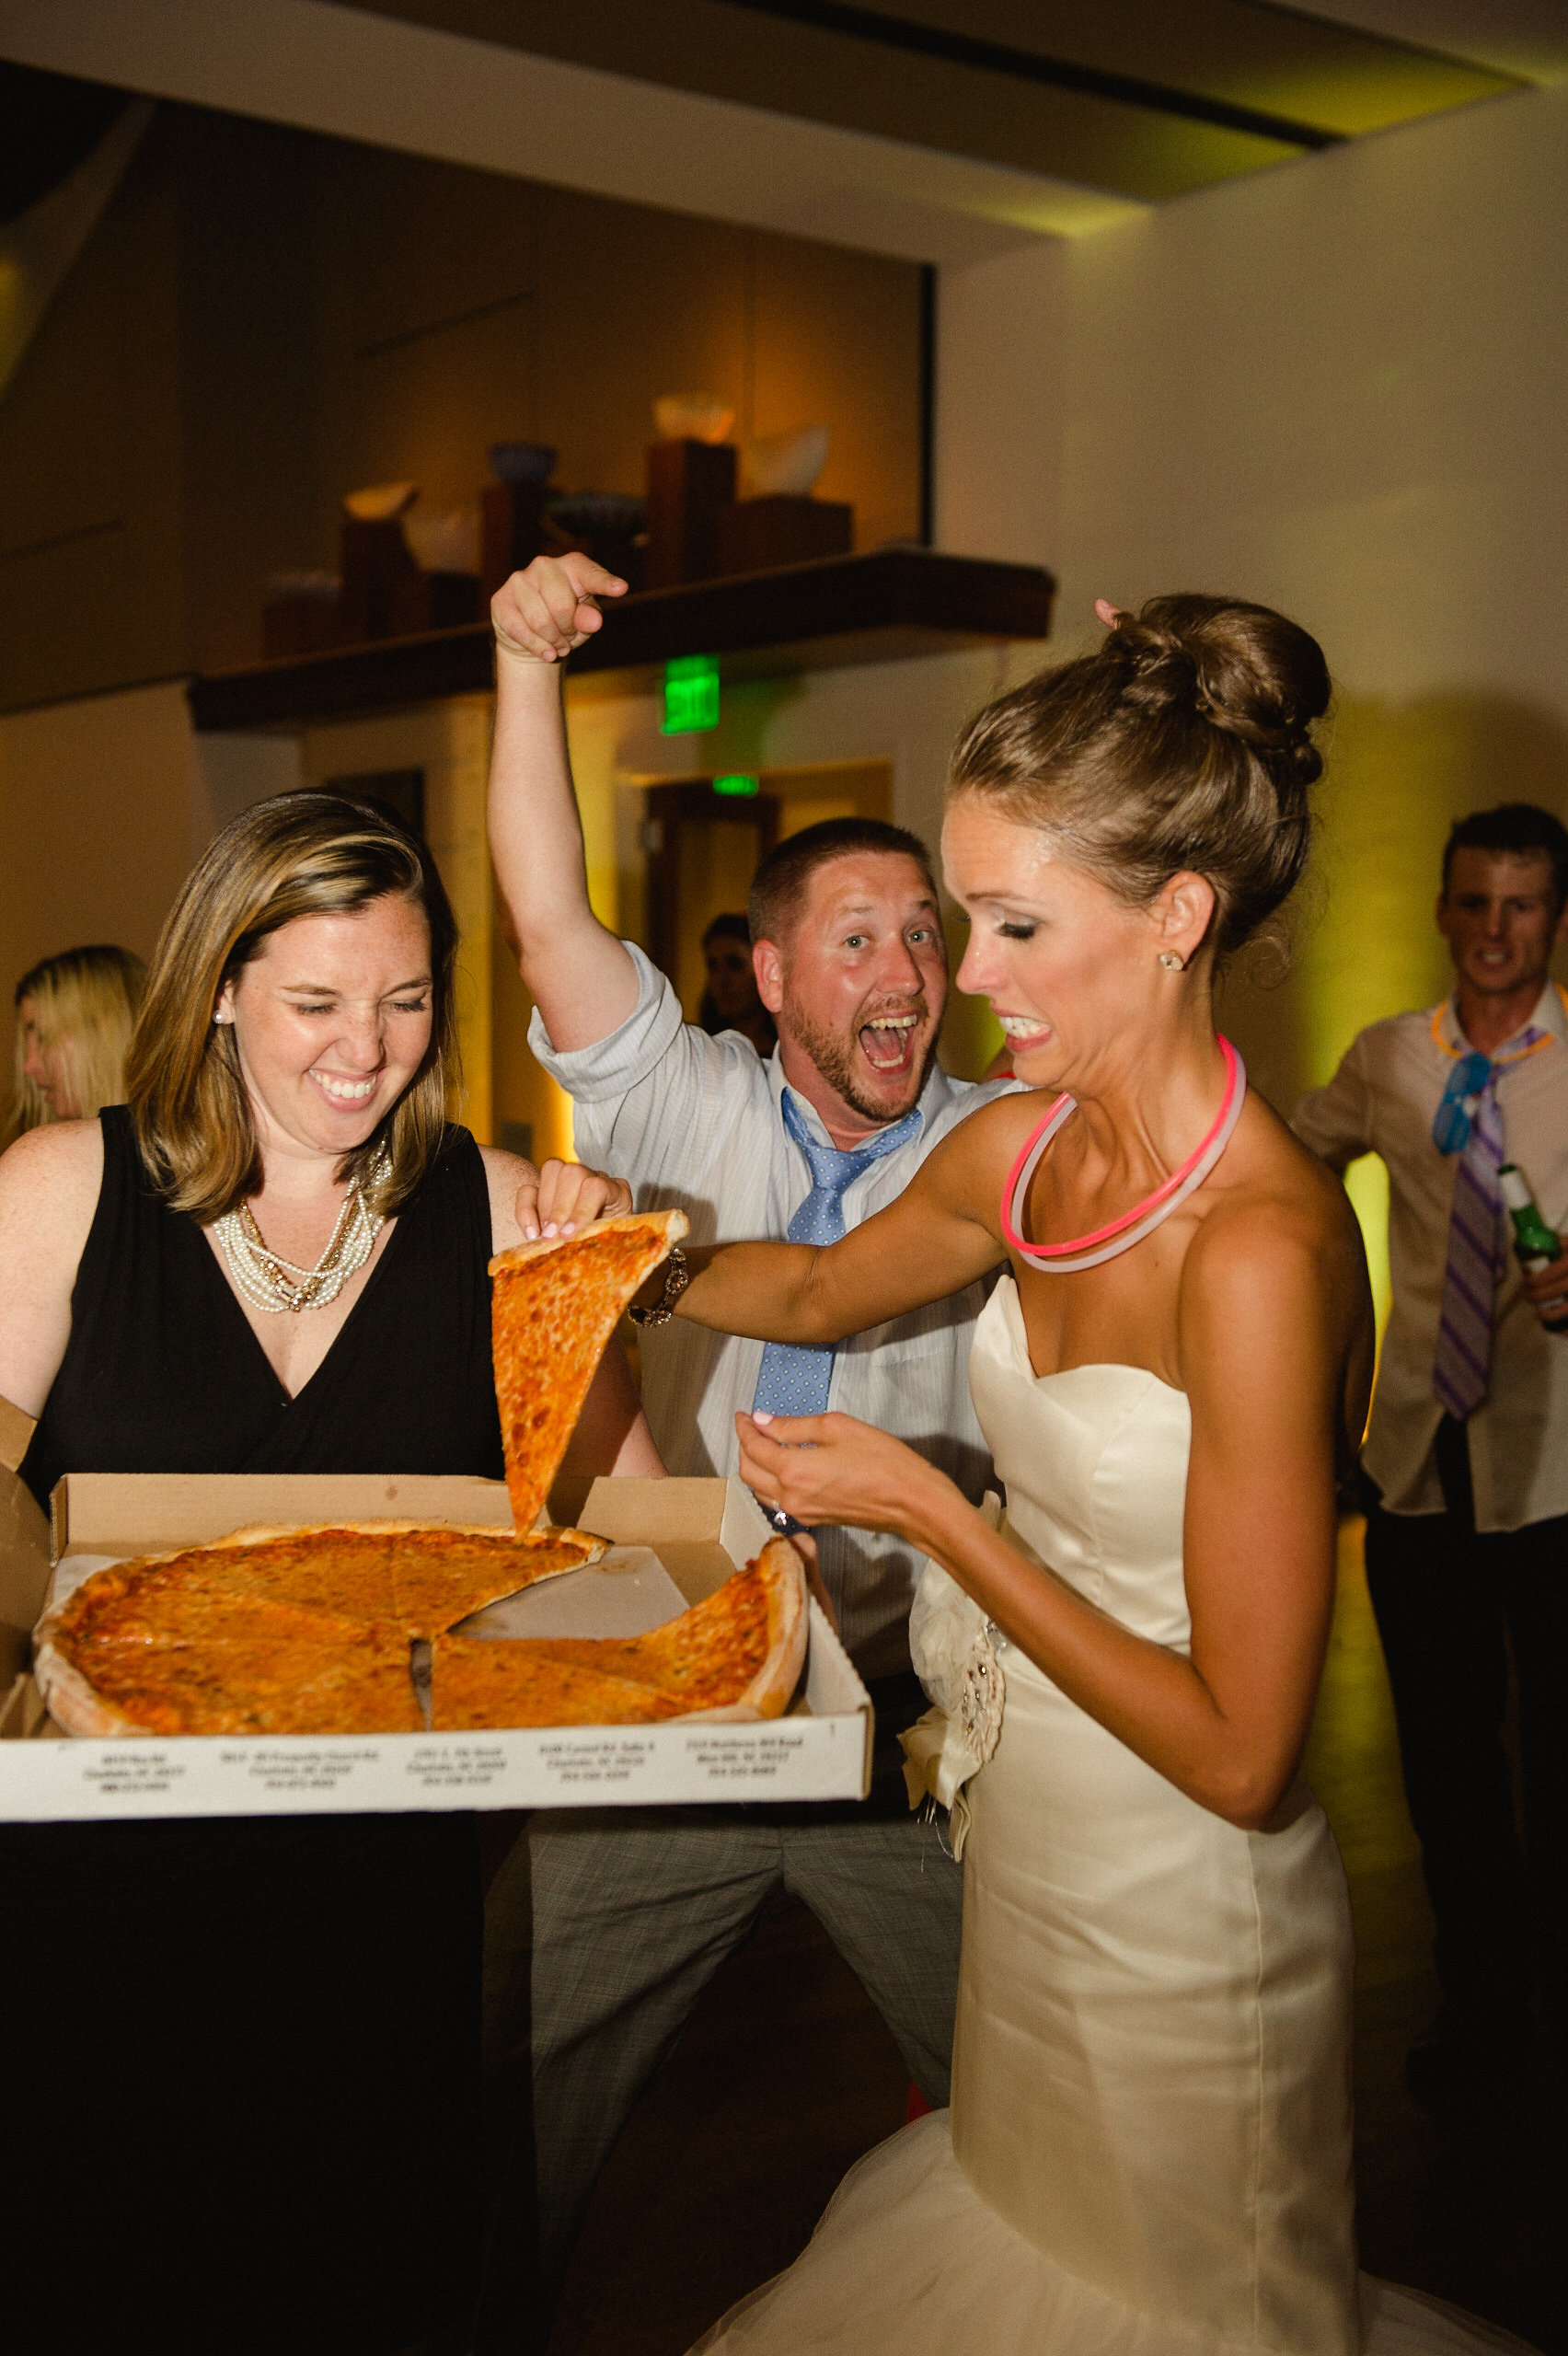 shelby&jordan|smitten&hooked|wedding|reception-443.jpg